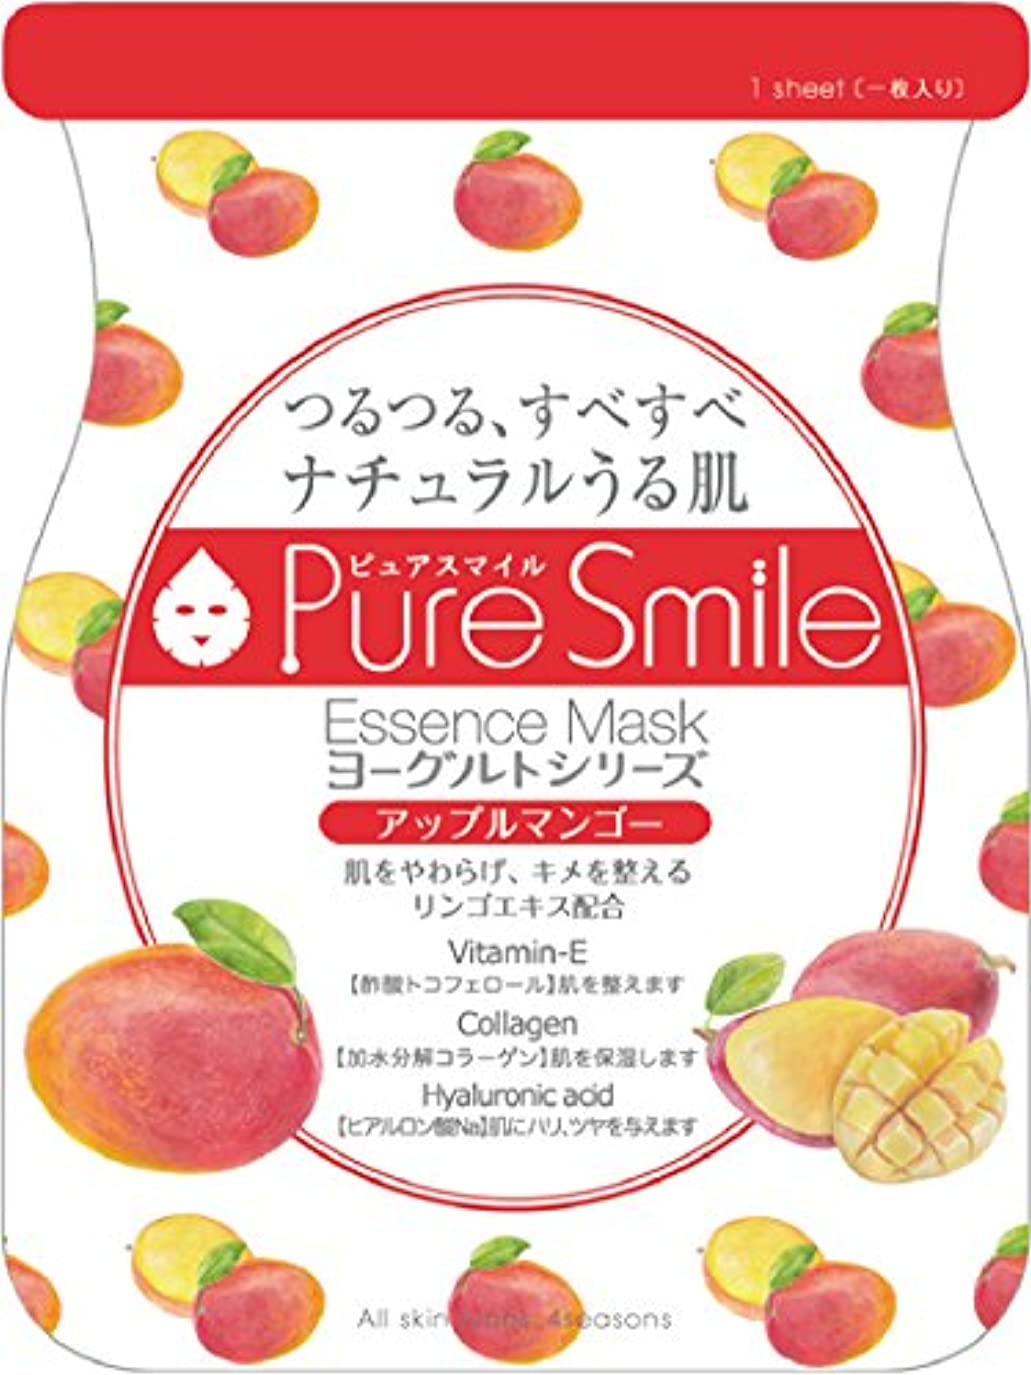 Pure Smile エッセンスマスク ヨーグルト アップルマンゴー 23ml?30枚